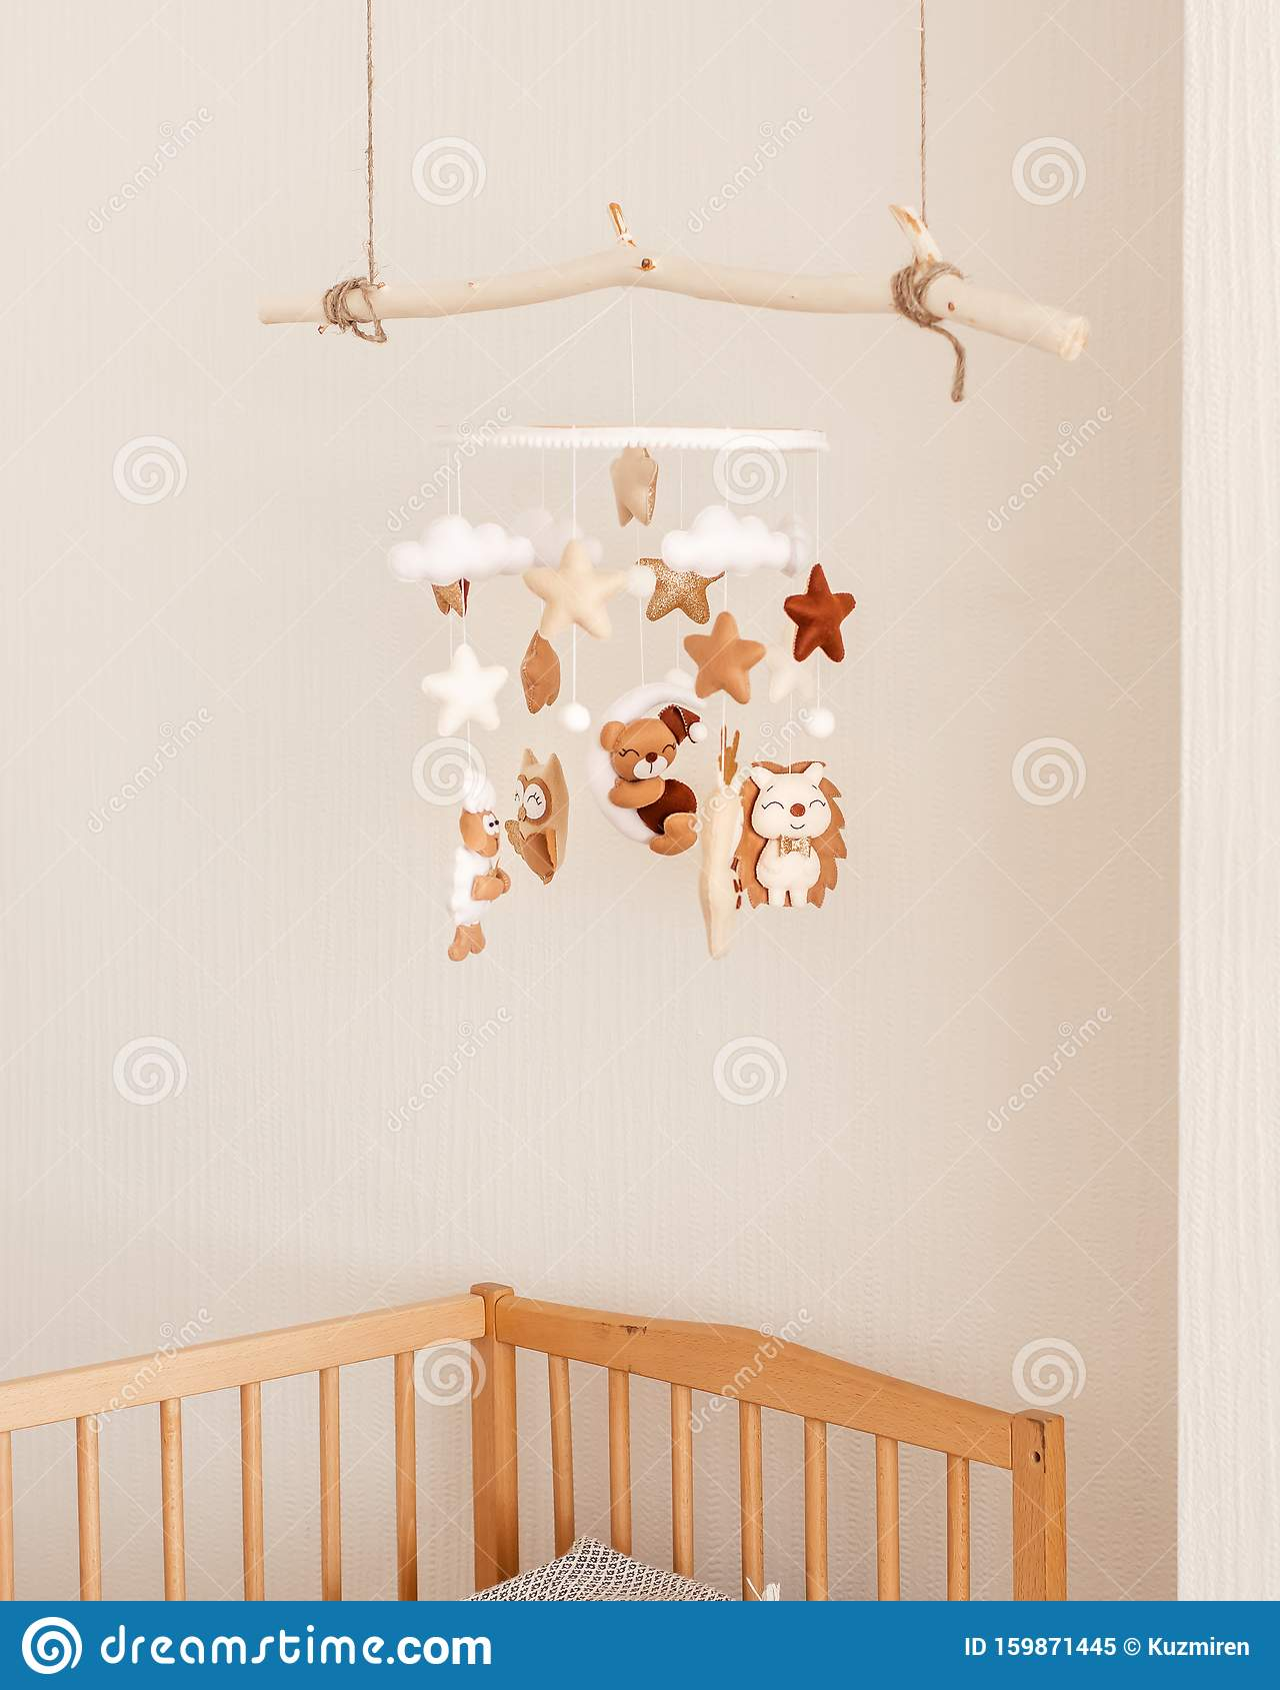 Boys girls handmade crochet baby childs nursery bedroom cot mobile owls star